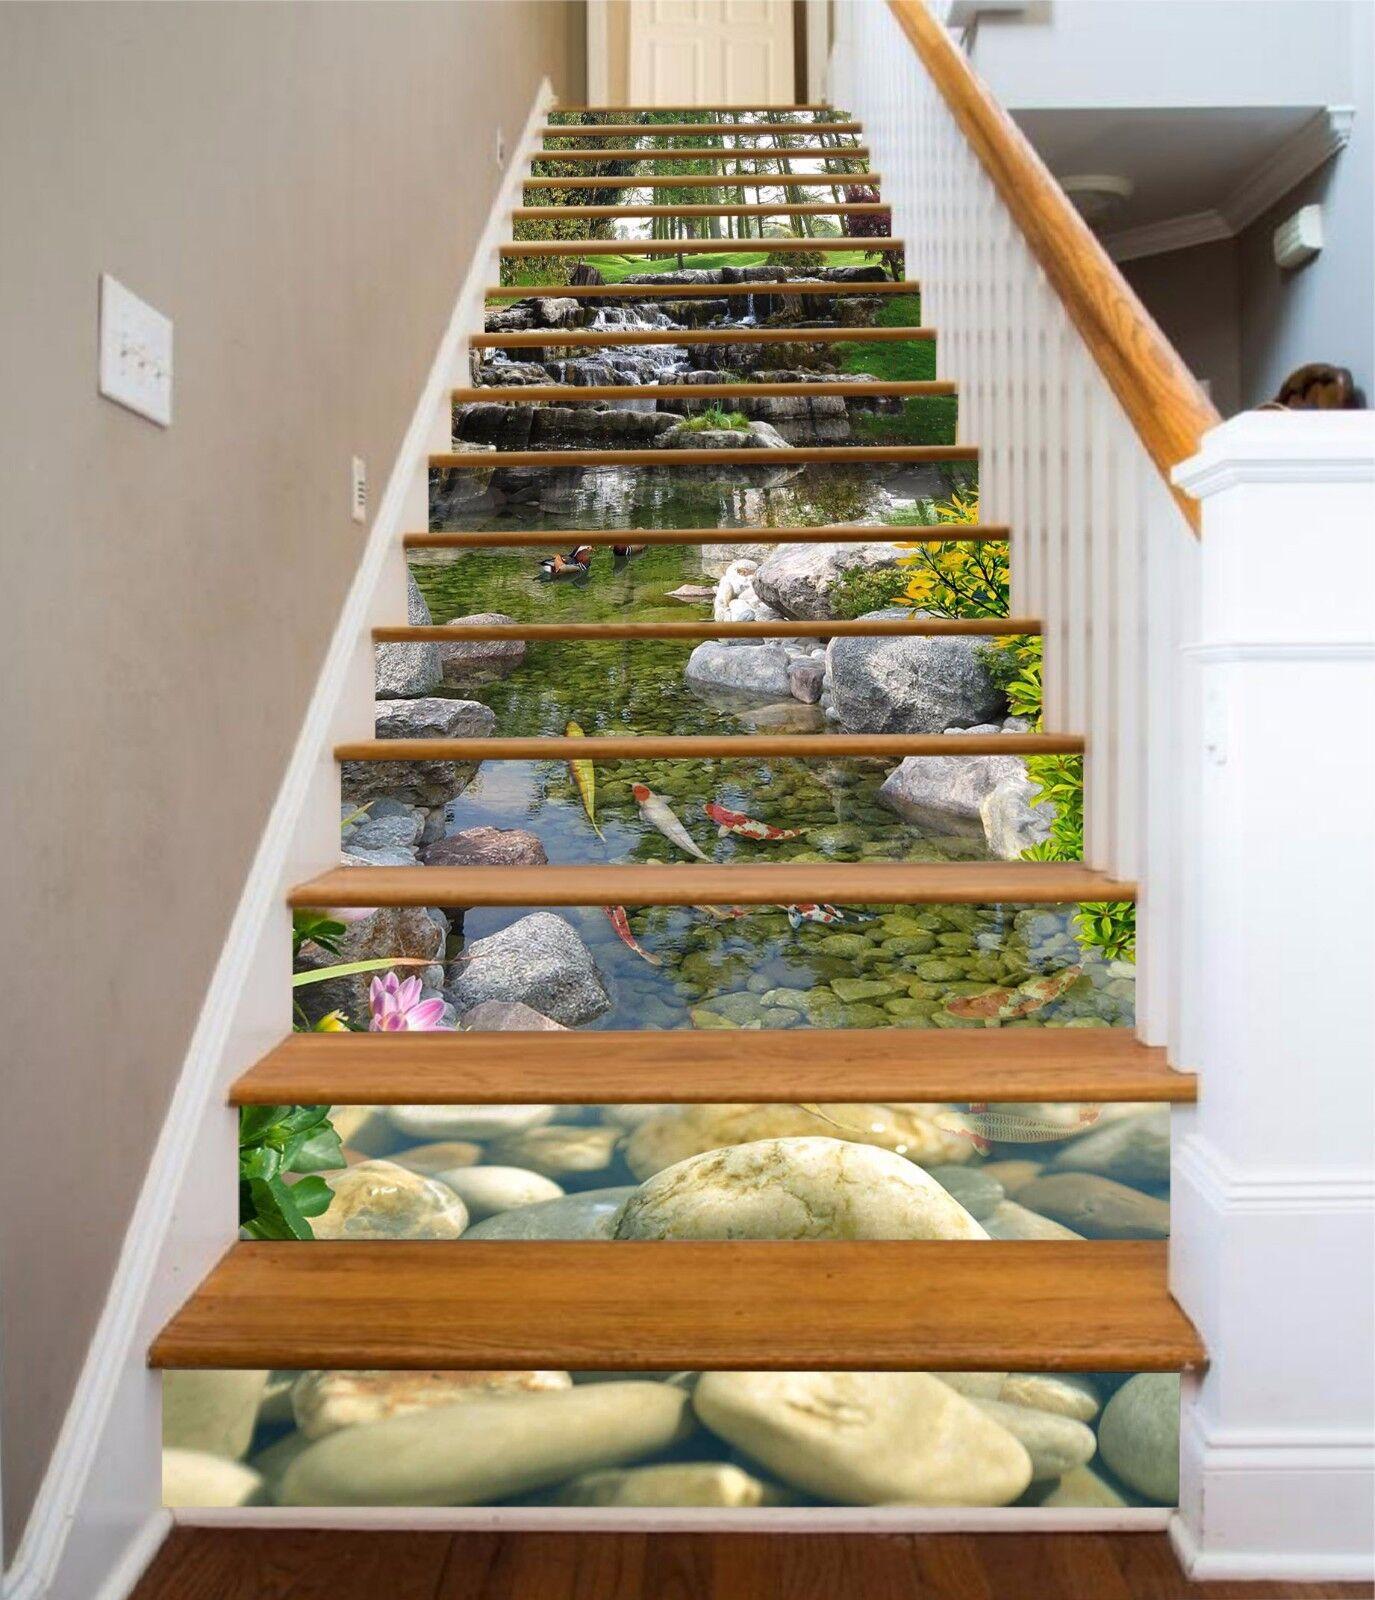 3D Fish Lake 076 treppes aufsteher dekoration foto Mural Vinyl abziehbild wandpaper US